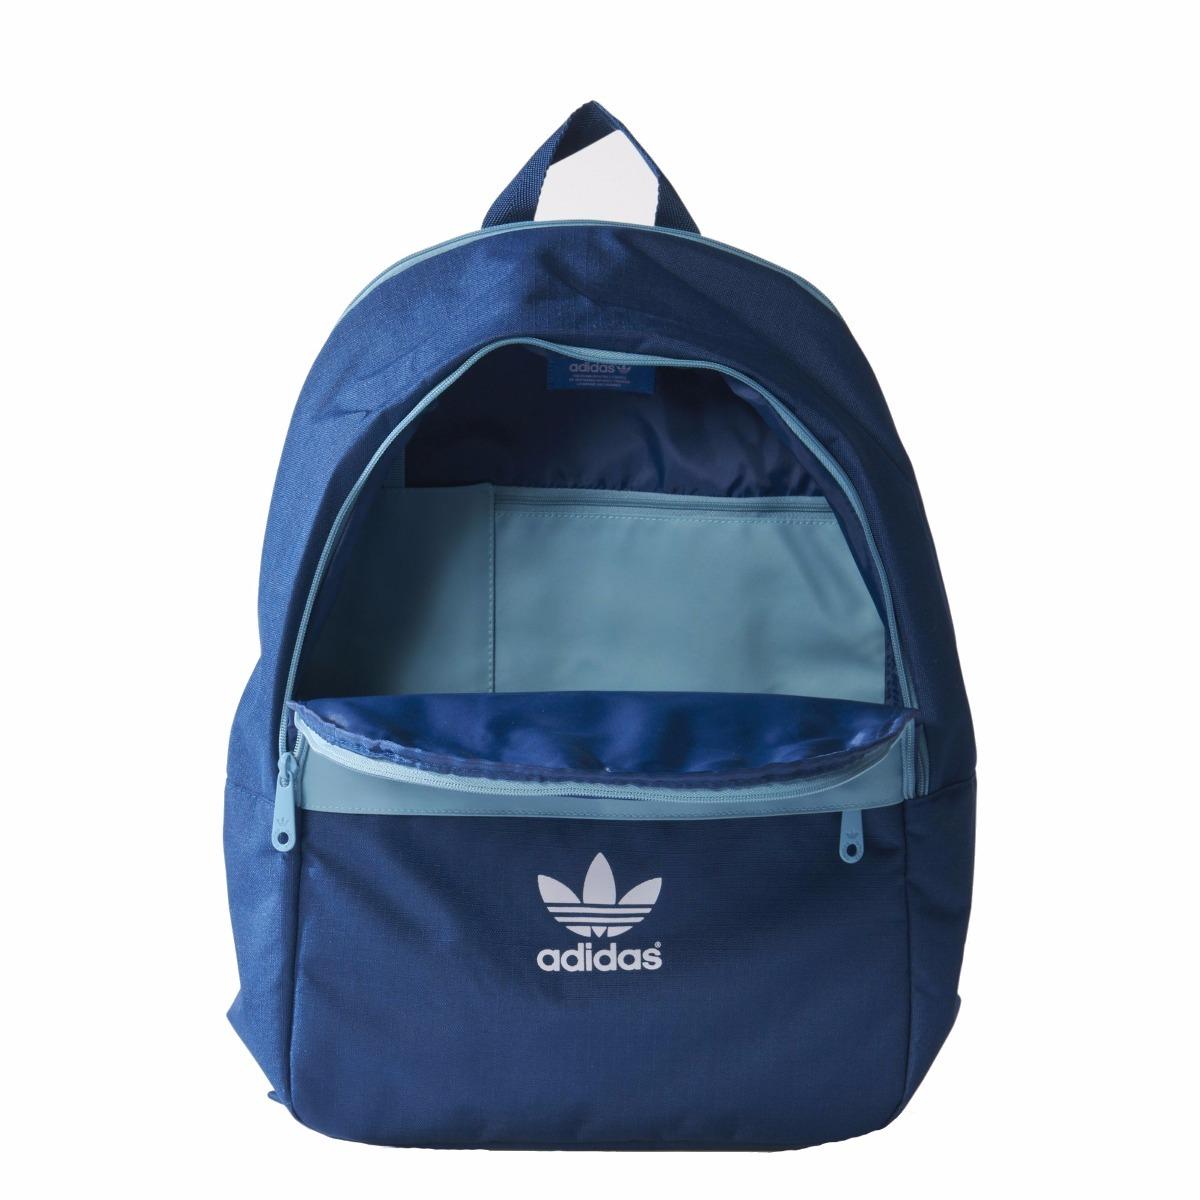 d8315d49d mochila adidas originals bp essential importada imperdible! Cargando zoom.